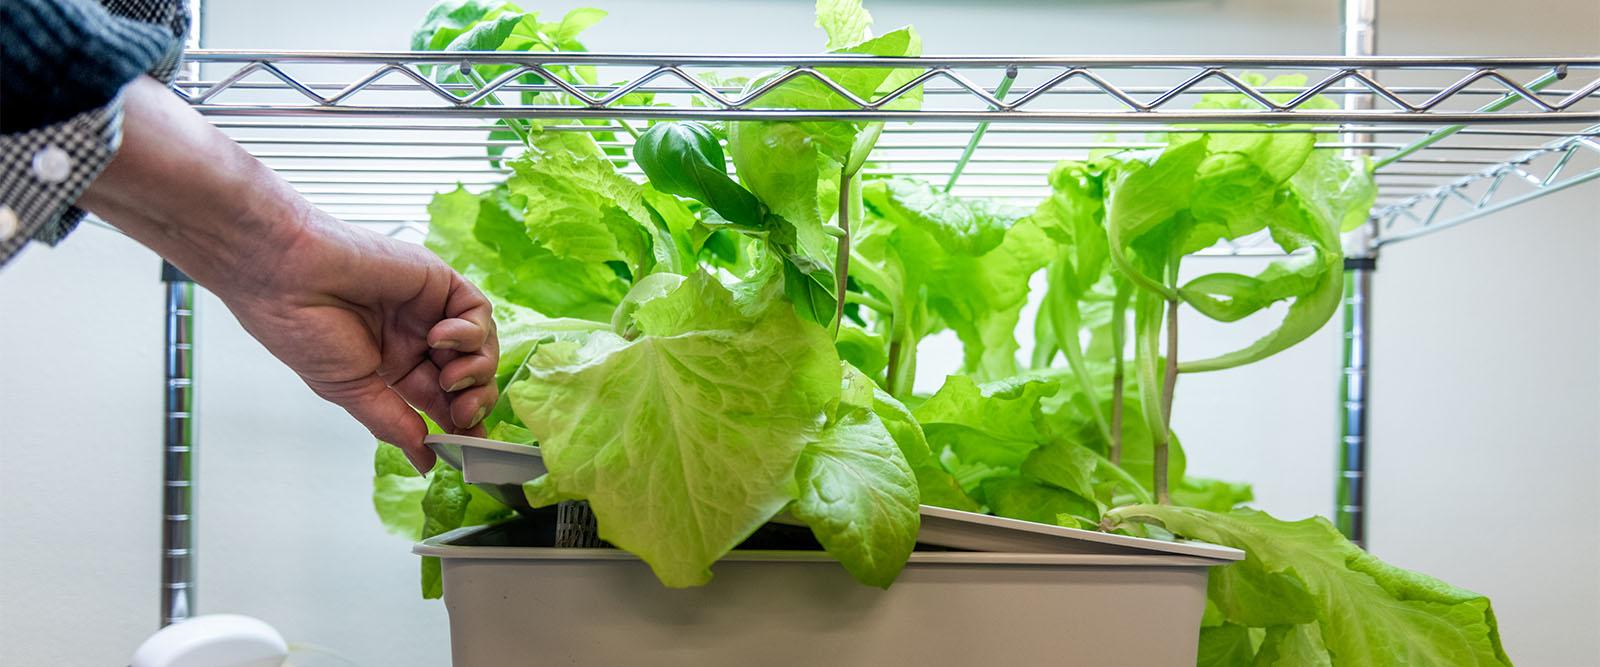 Plant on a shelves.